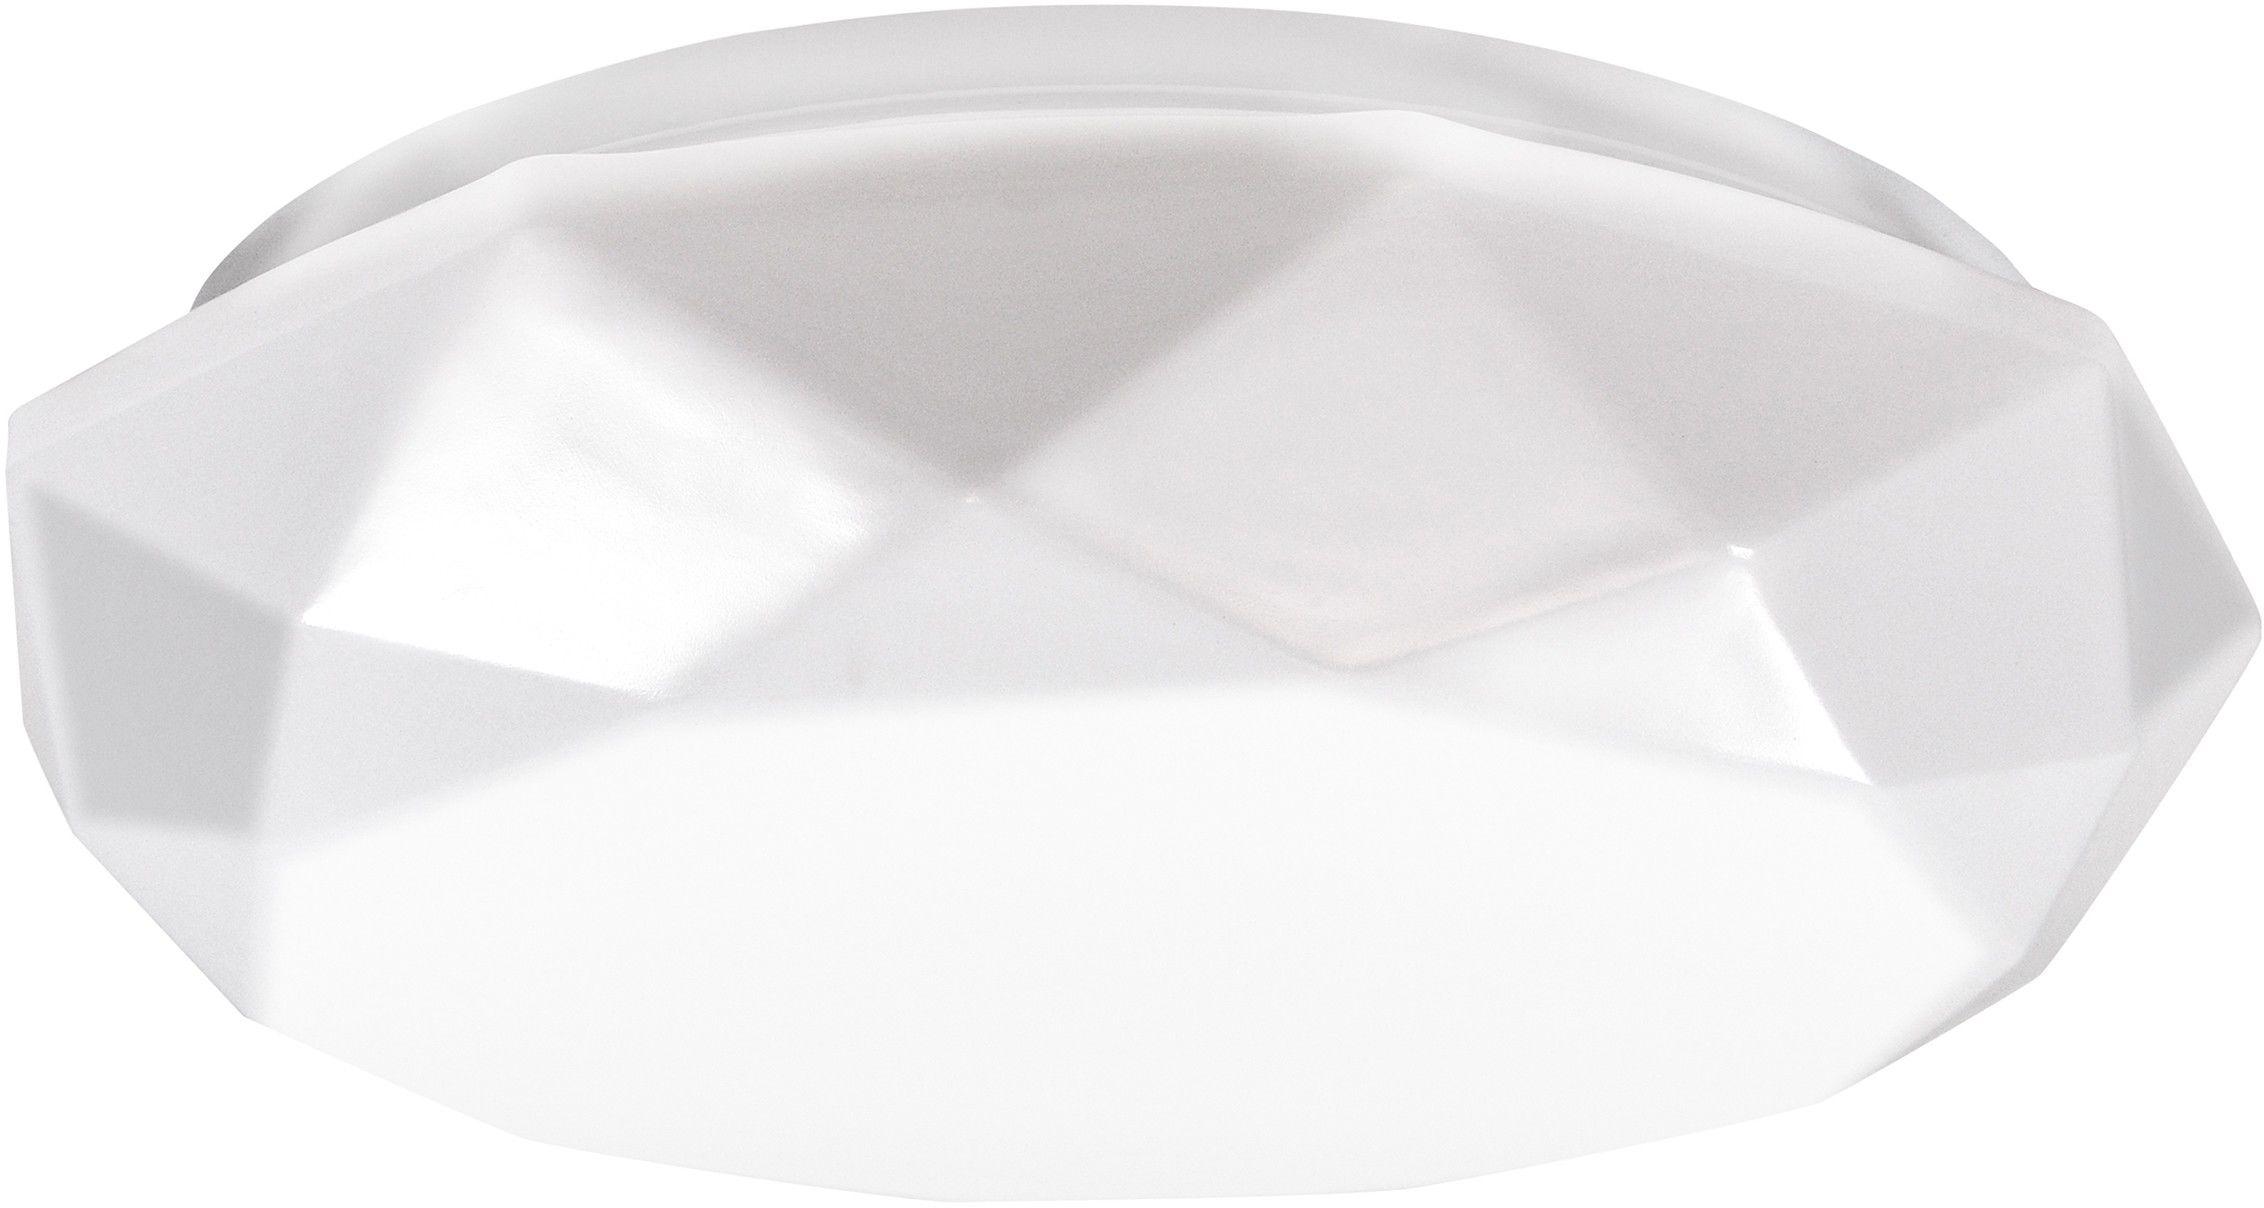 Plafon LED Polux Selina 17 W 1300 lm